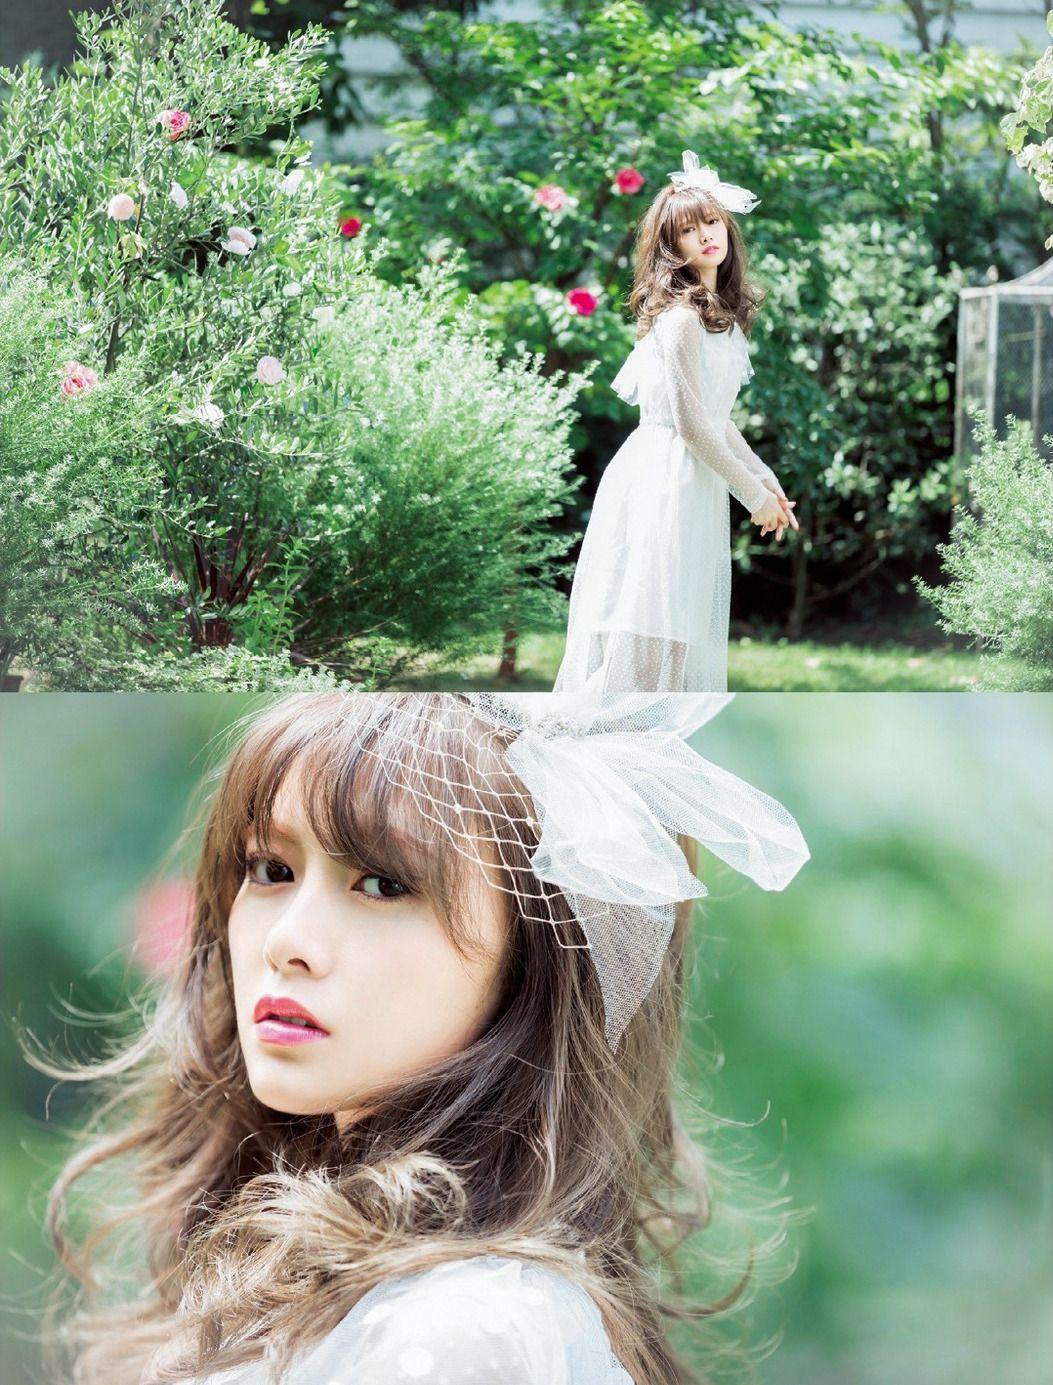 Pin by Michael Chen on AKB48.NGZK46.HKT48 Flower girl